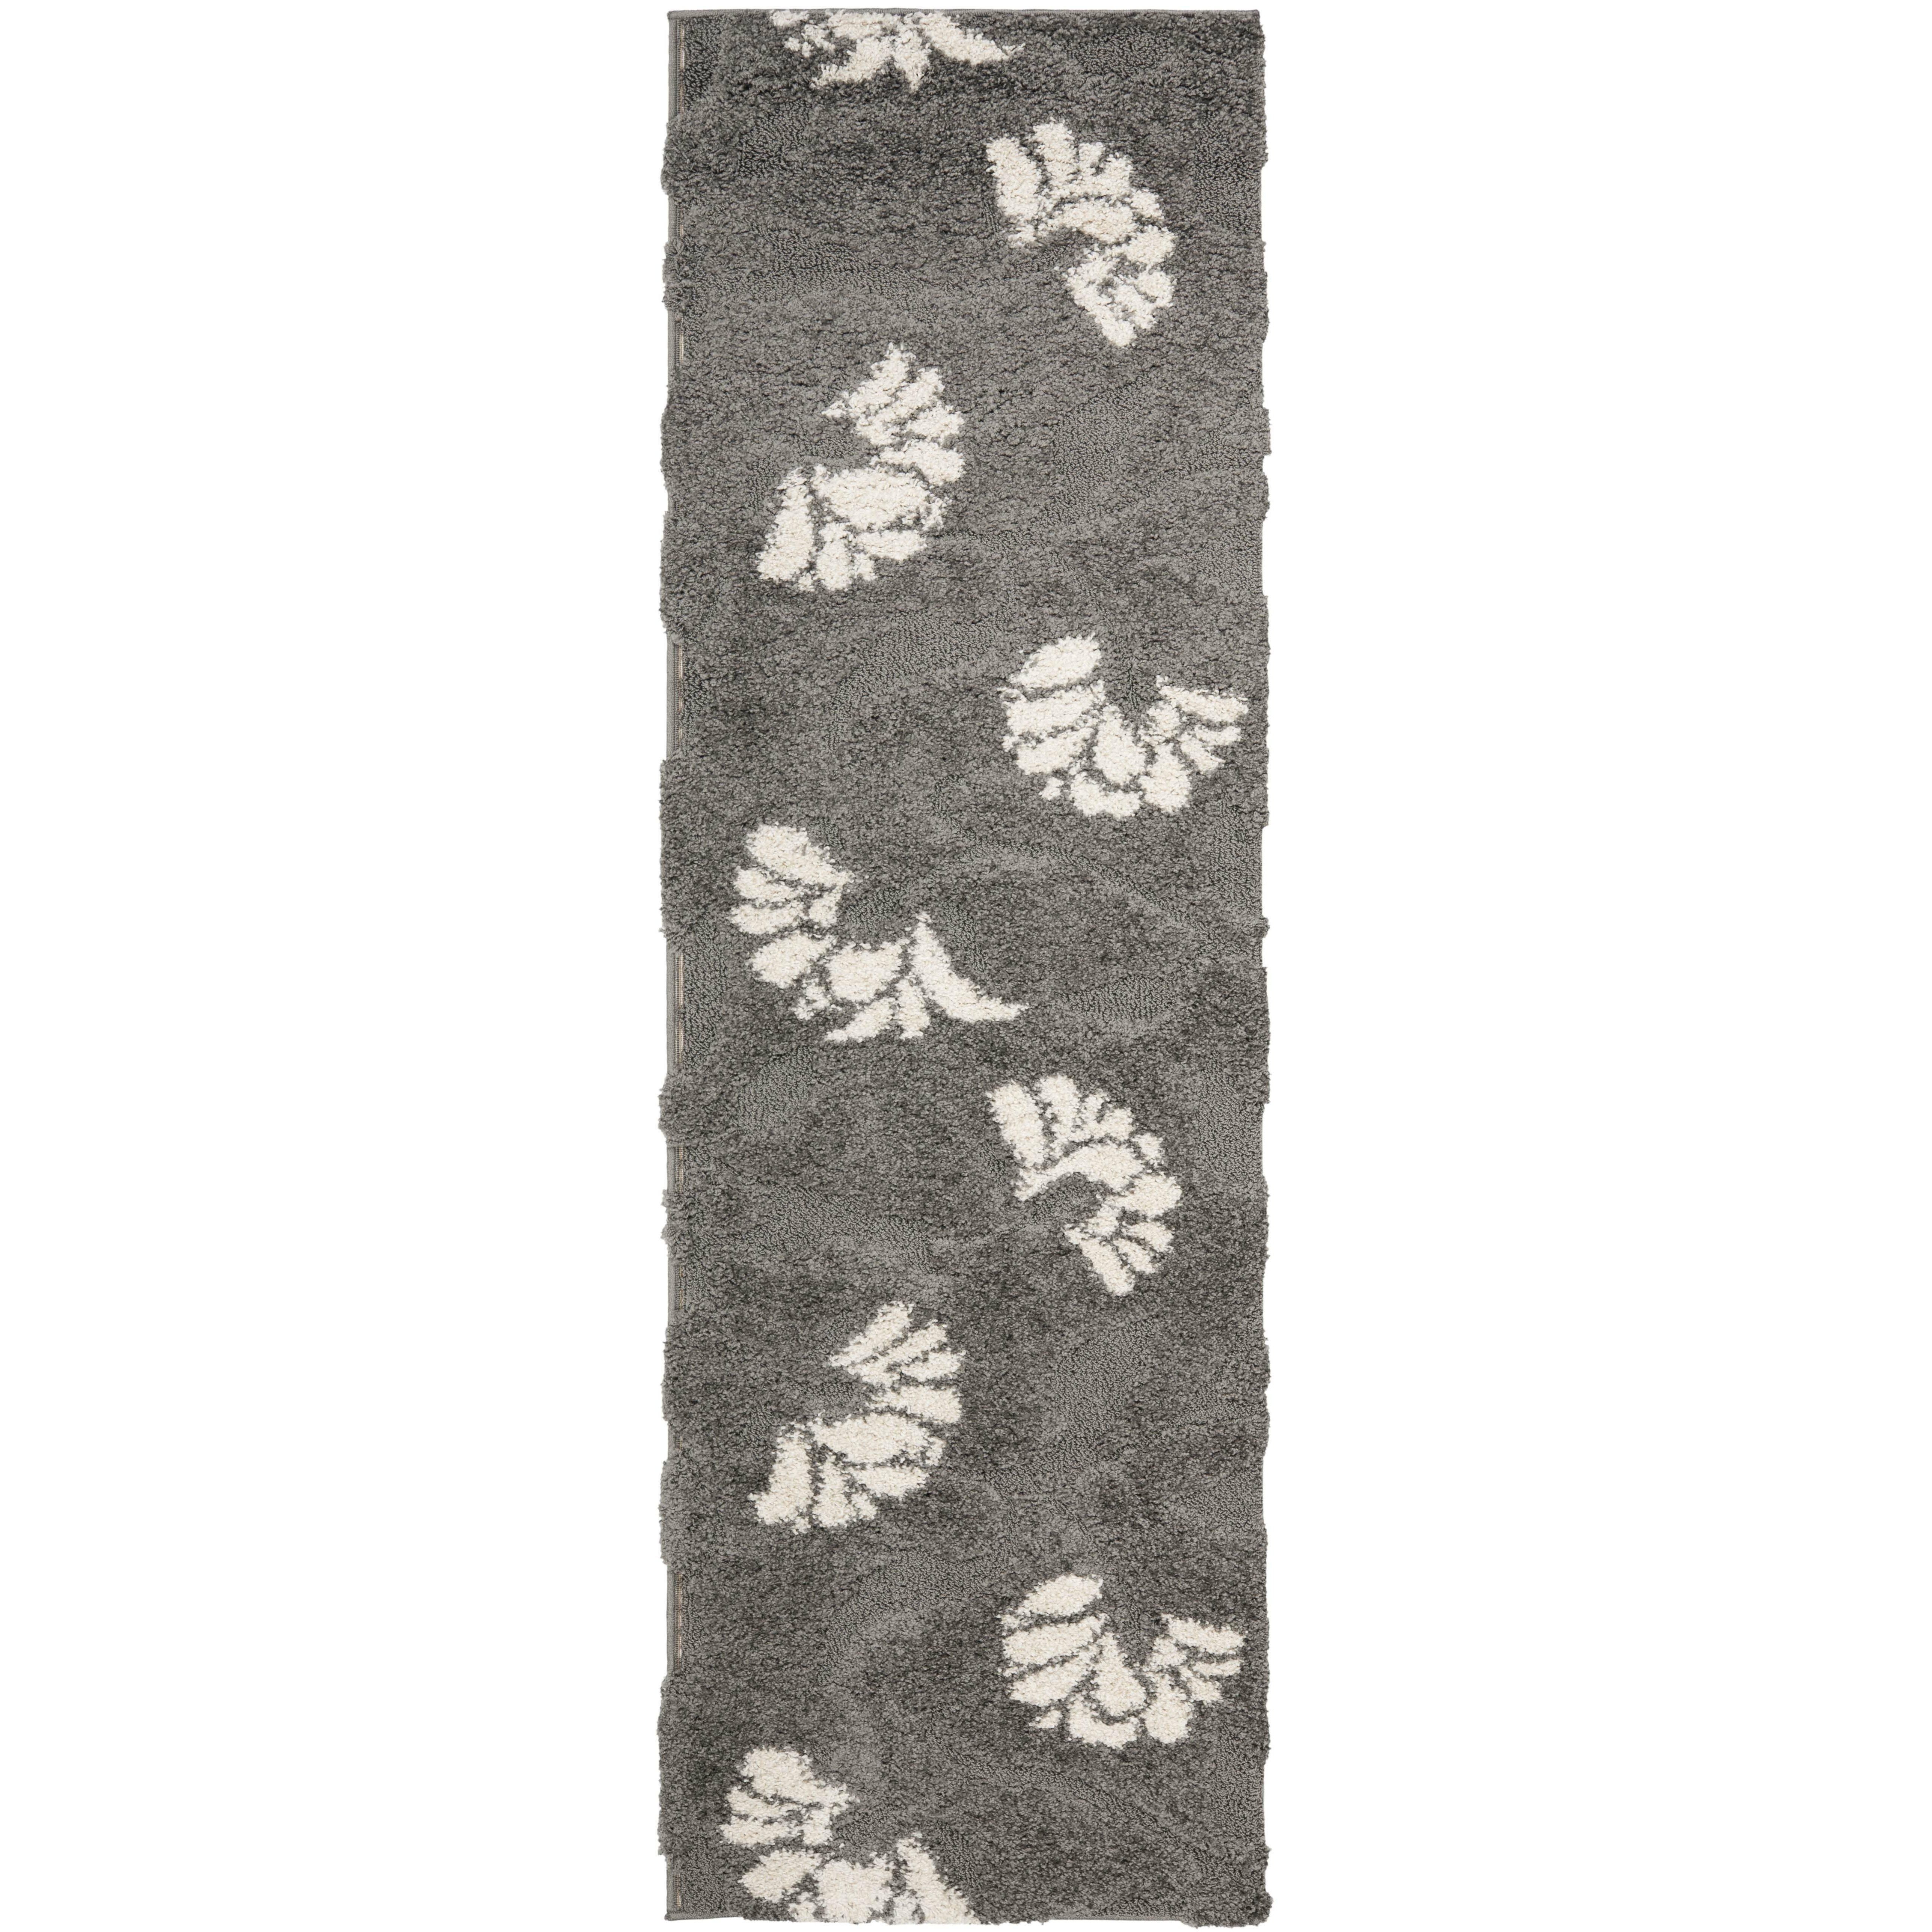 Dark Silver Rug: House Of Hampton Flanery Dark Grey/Beige Area Rug